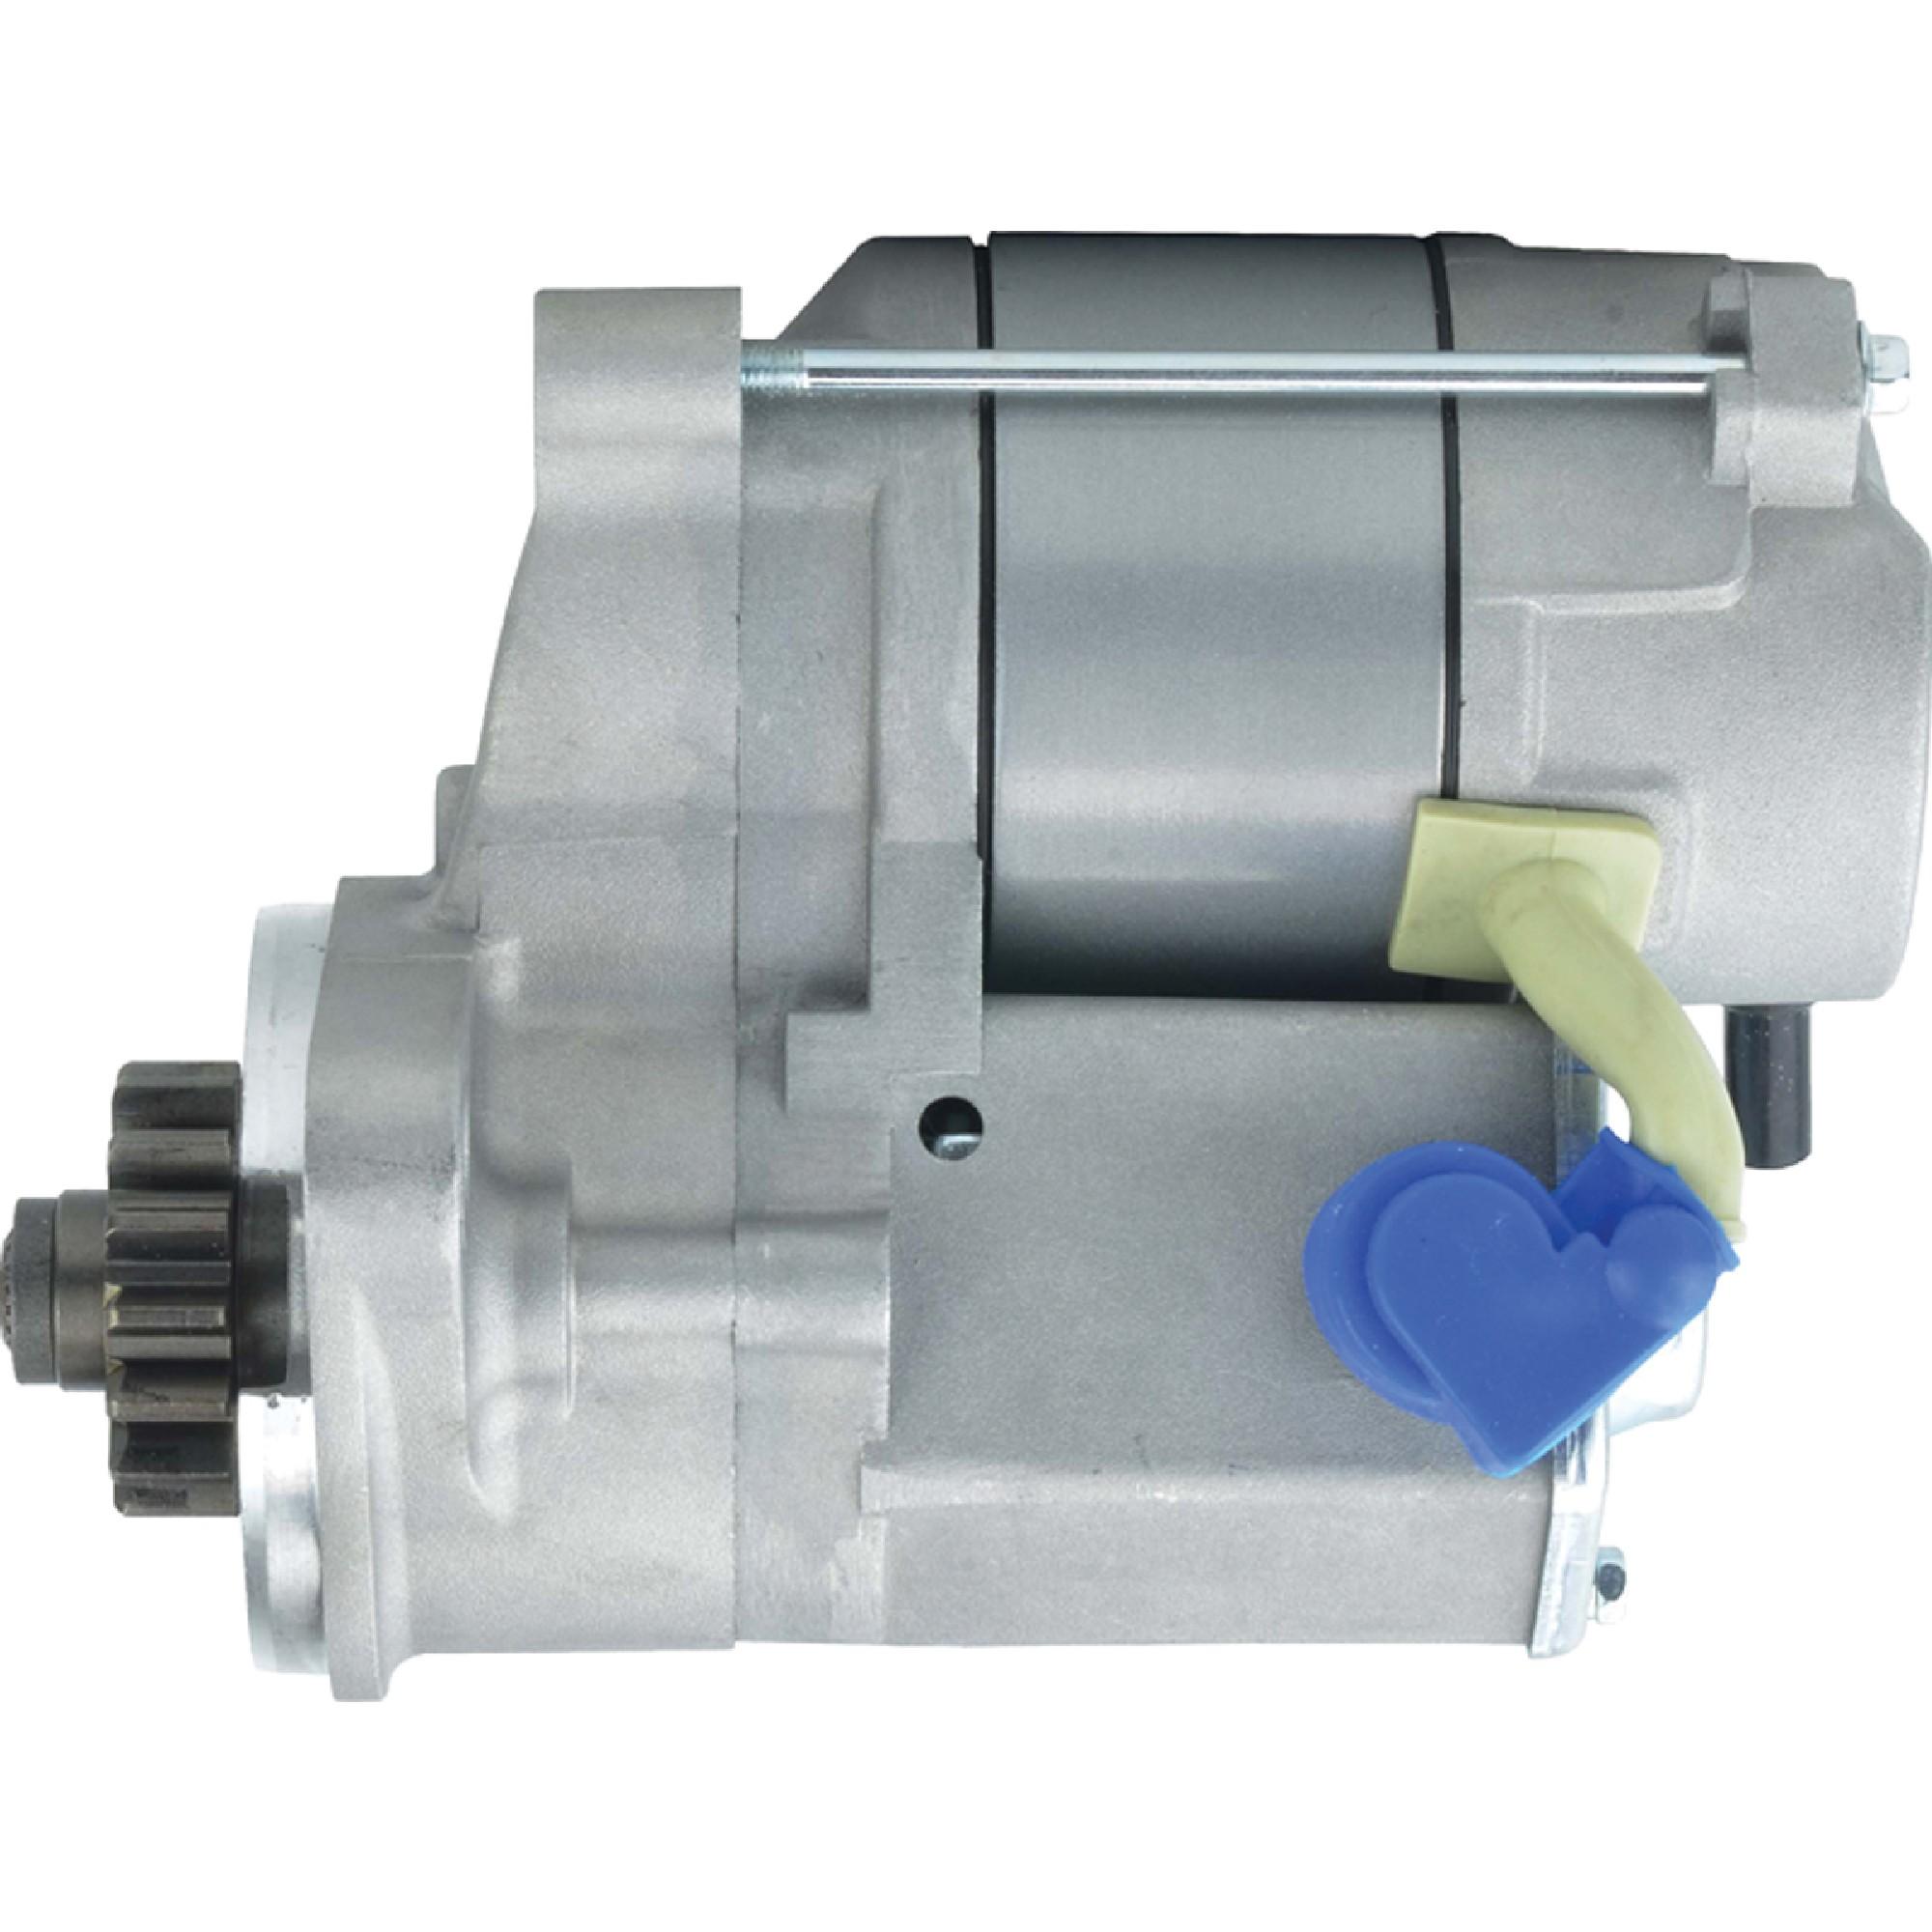 NEW STARTER FITS MASSEY FERGUSON TRACTOR MF1205 ISEKI ENGINE 6281-100-005-00